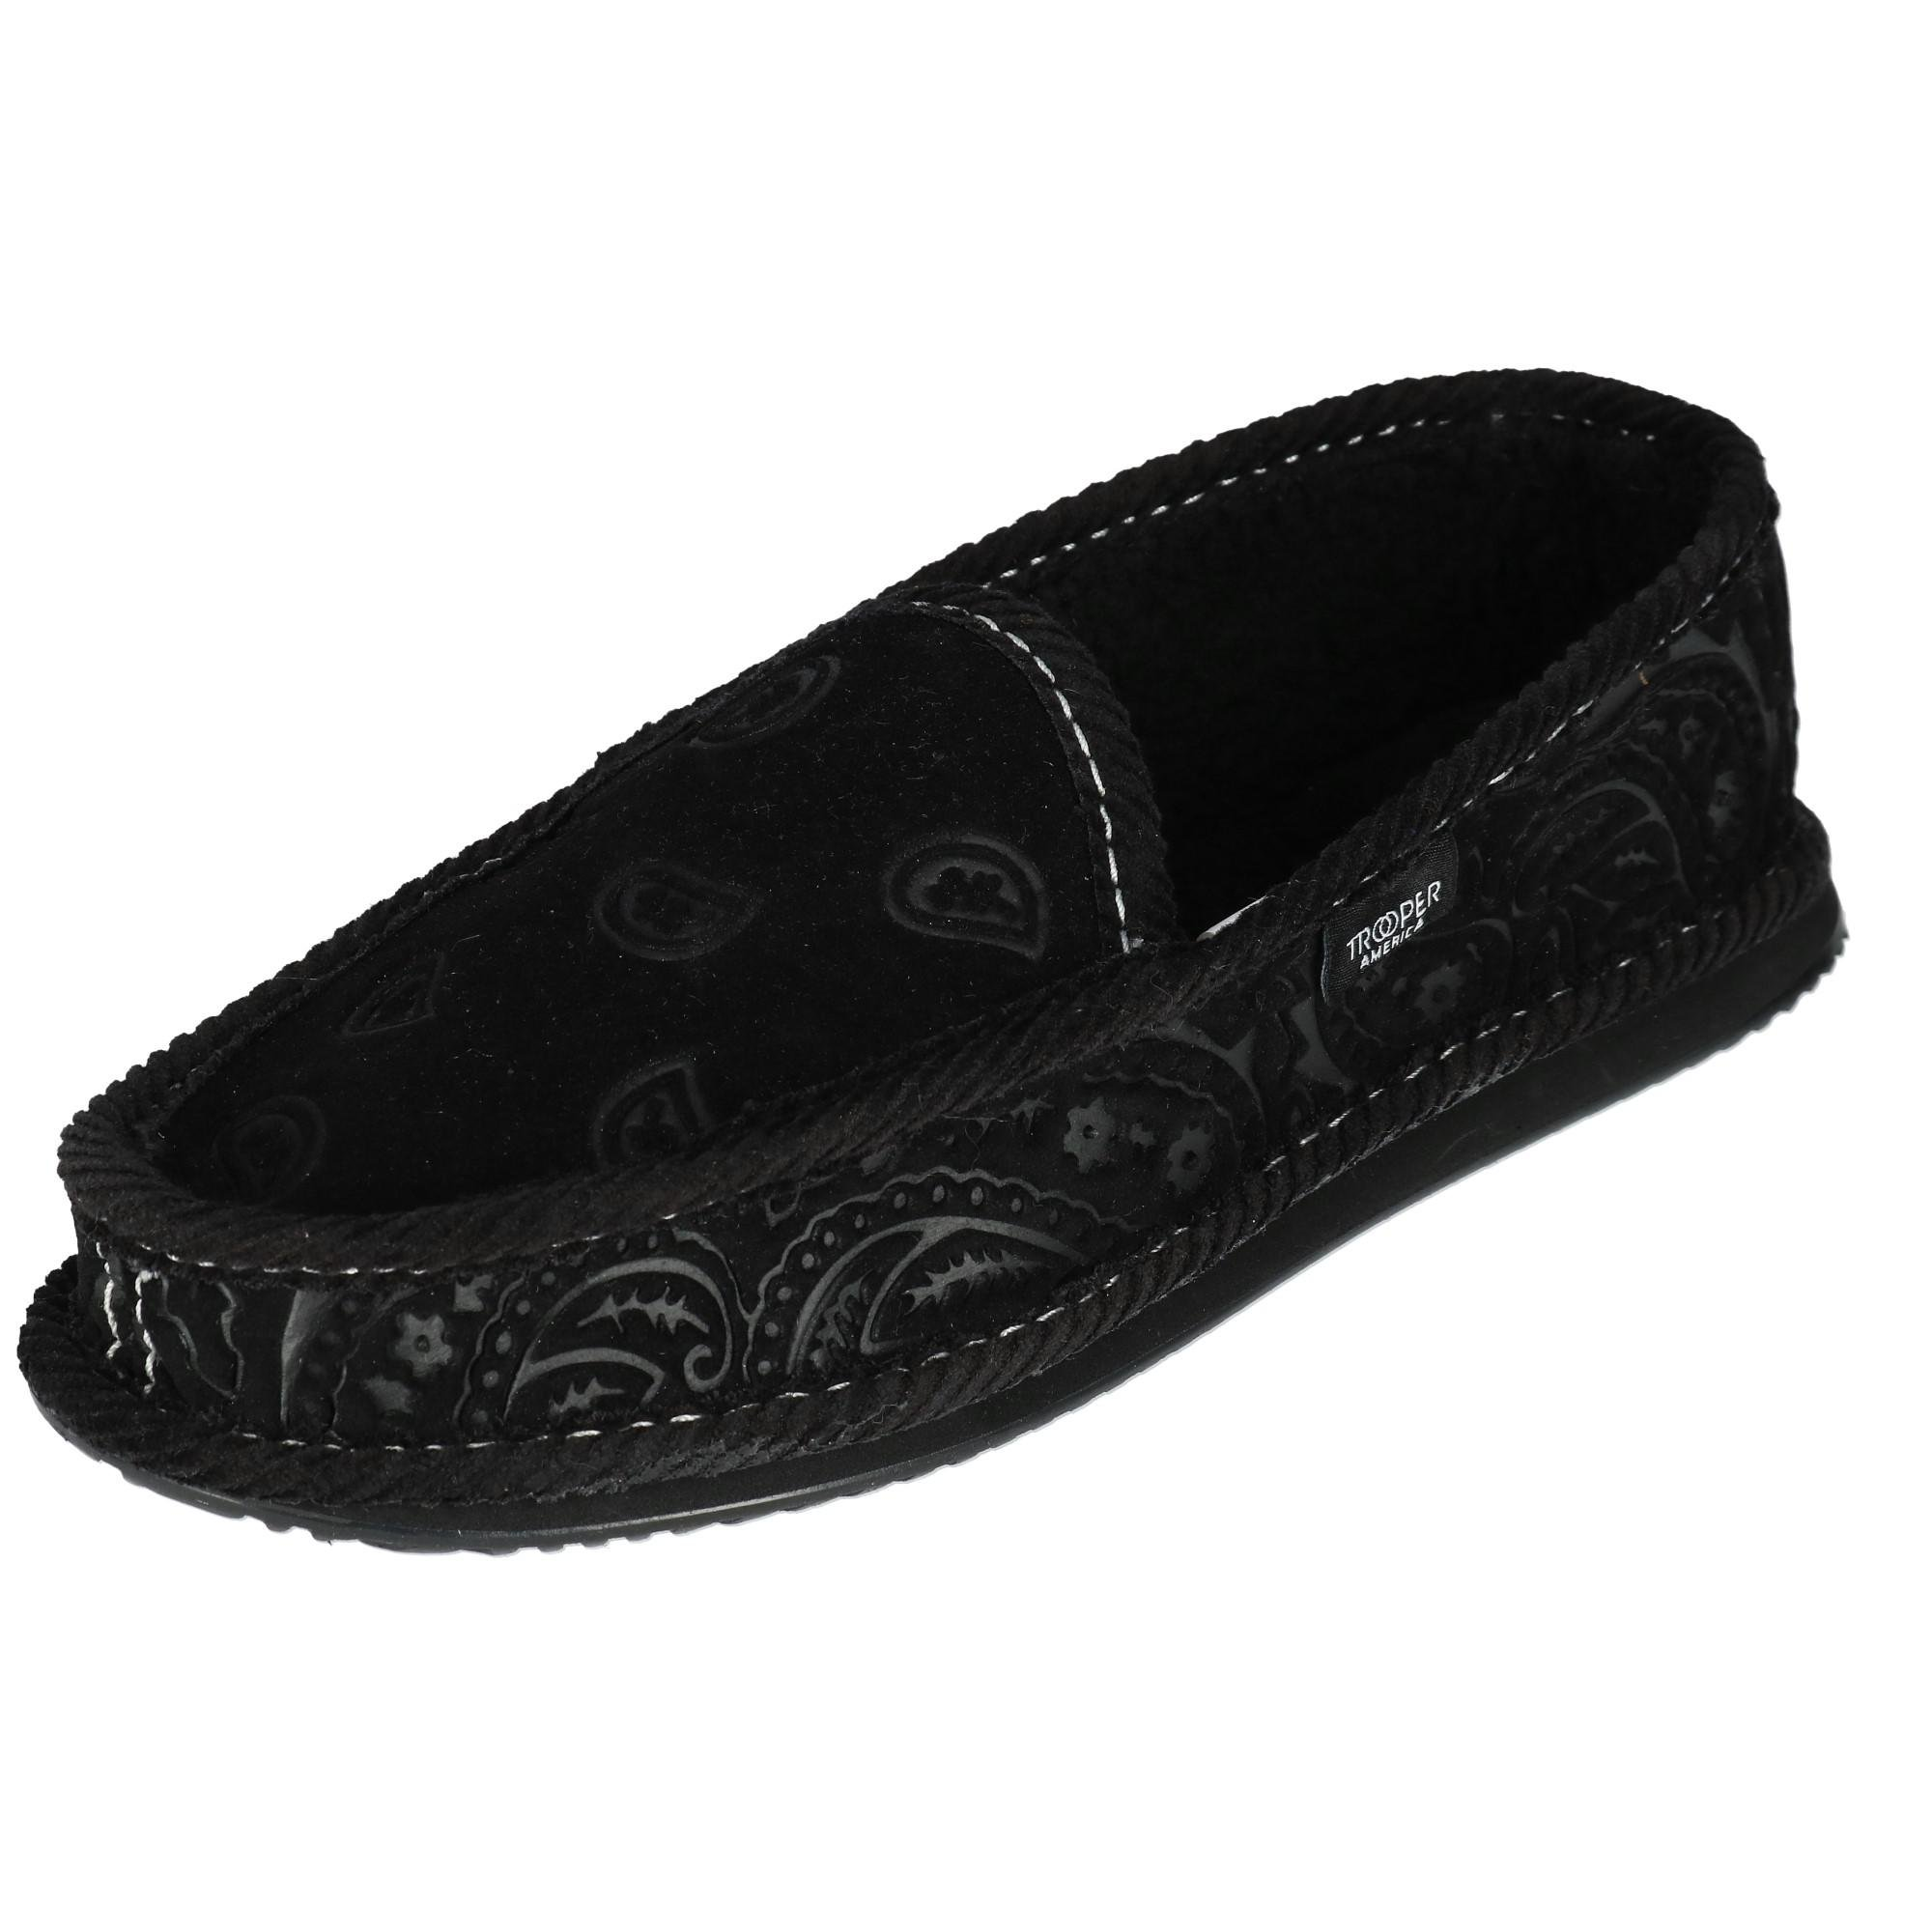 Trooper America Men's Black on Black Paisley Bandana Print House Shoe Slippers